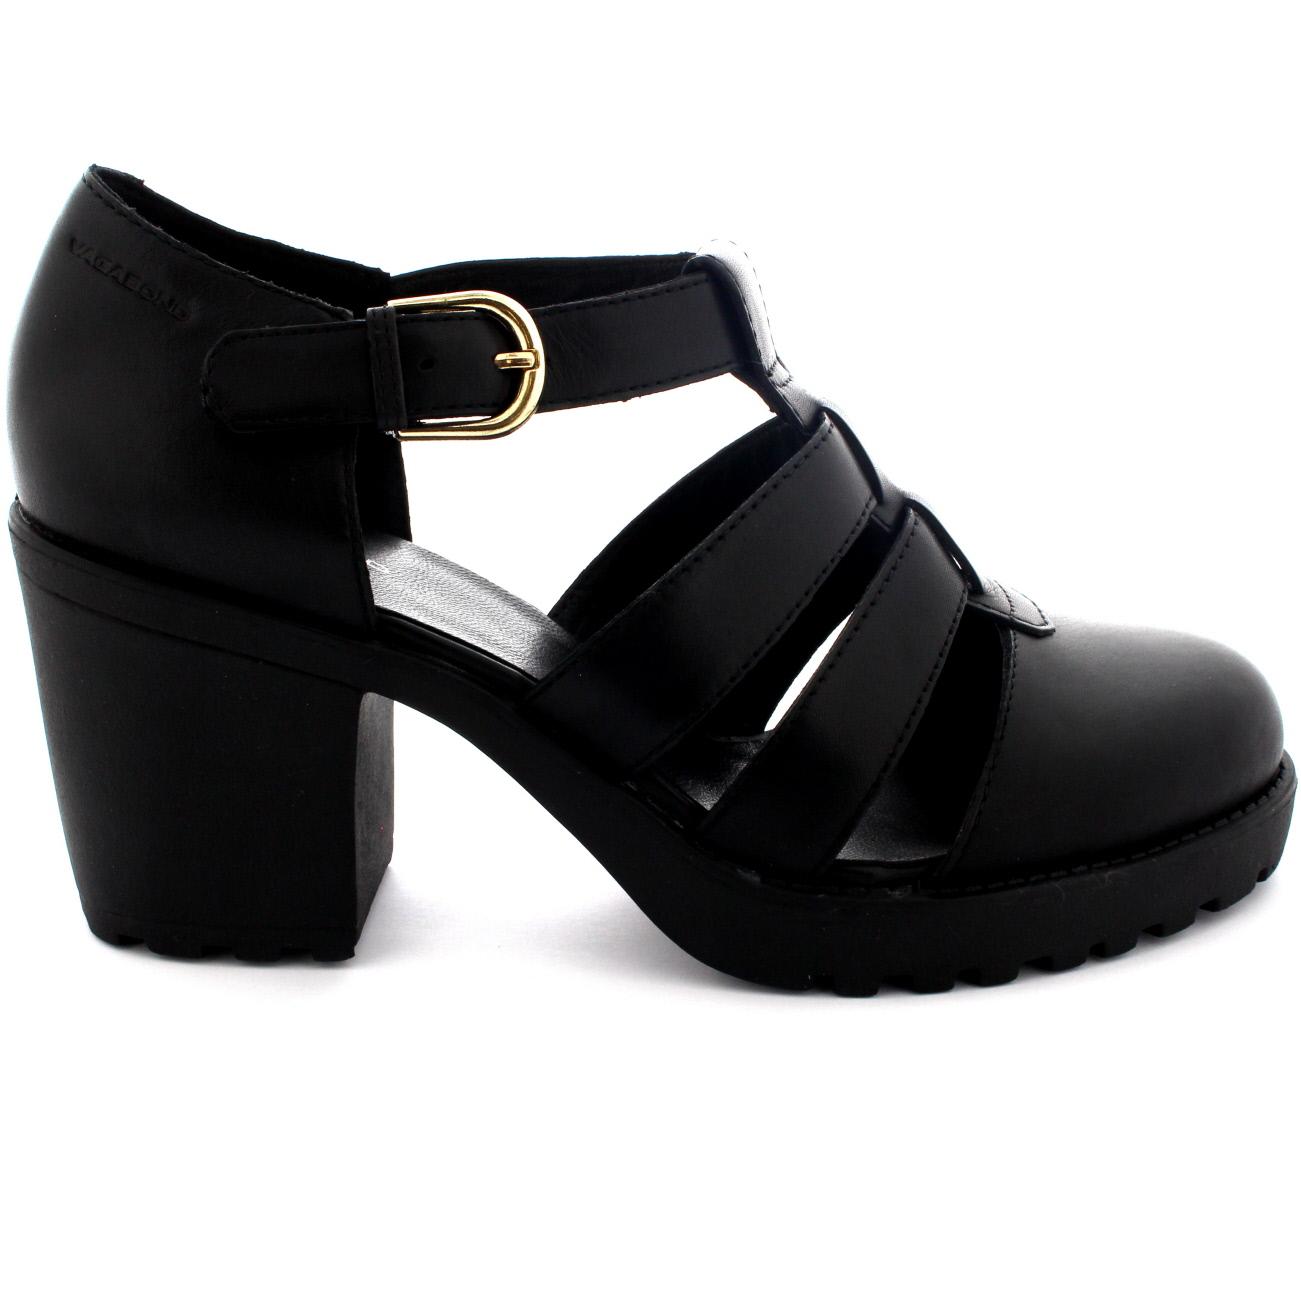 Womens sandals mid heel - Womens Vagabond Grace Buckle Leather Festival Mid Heel